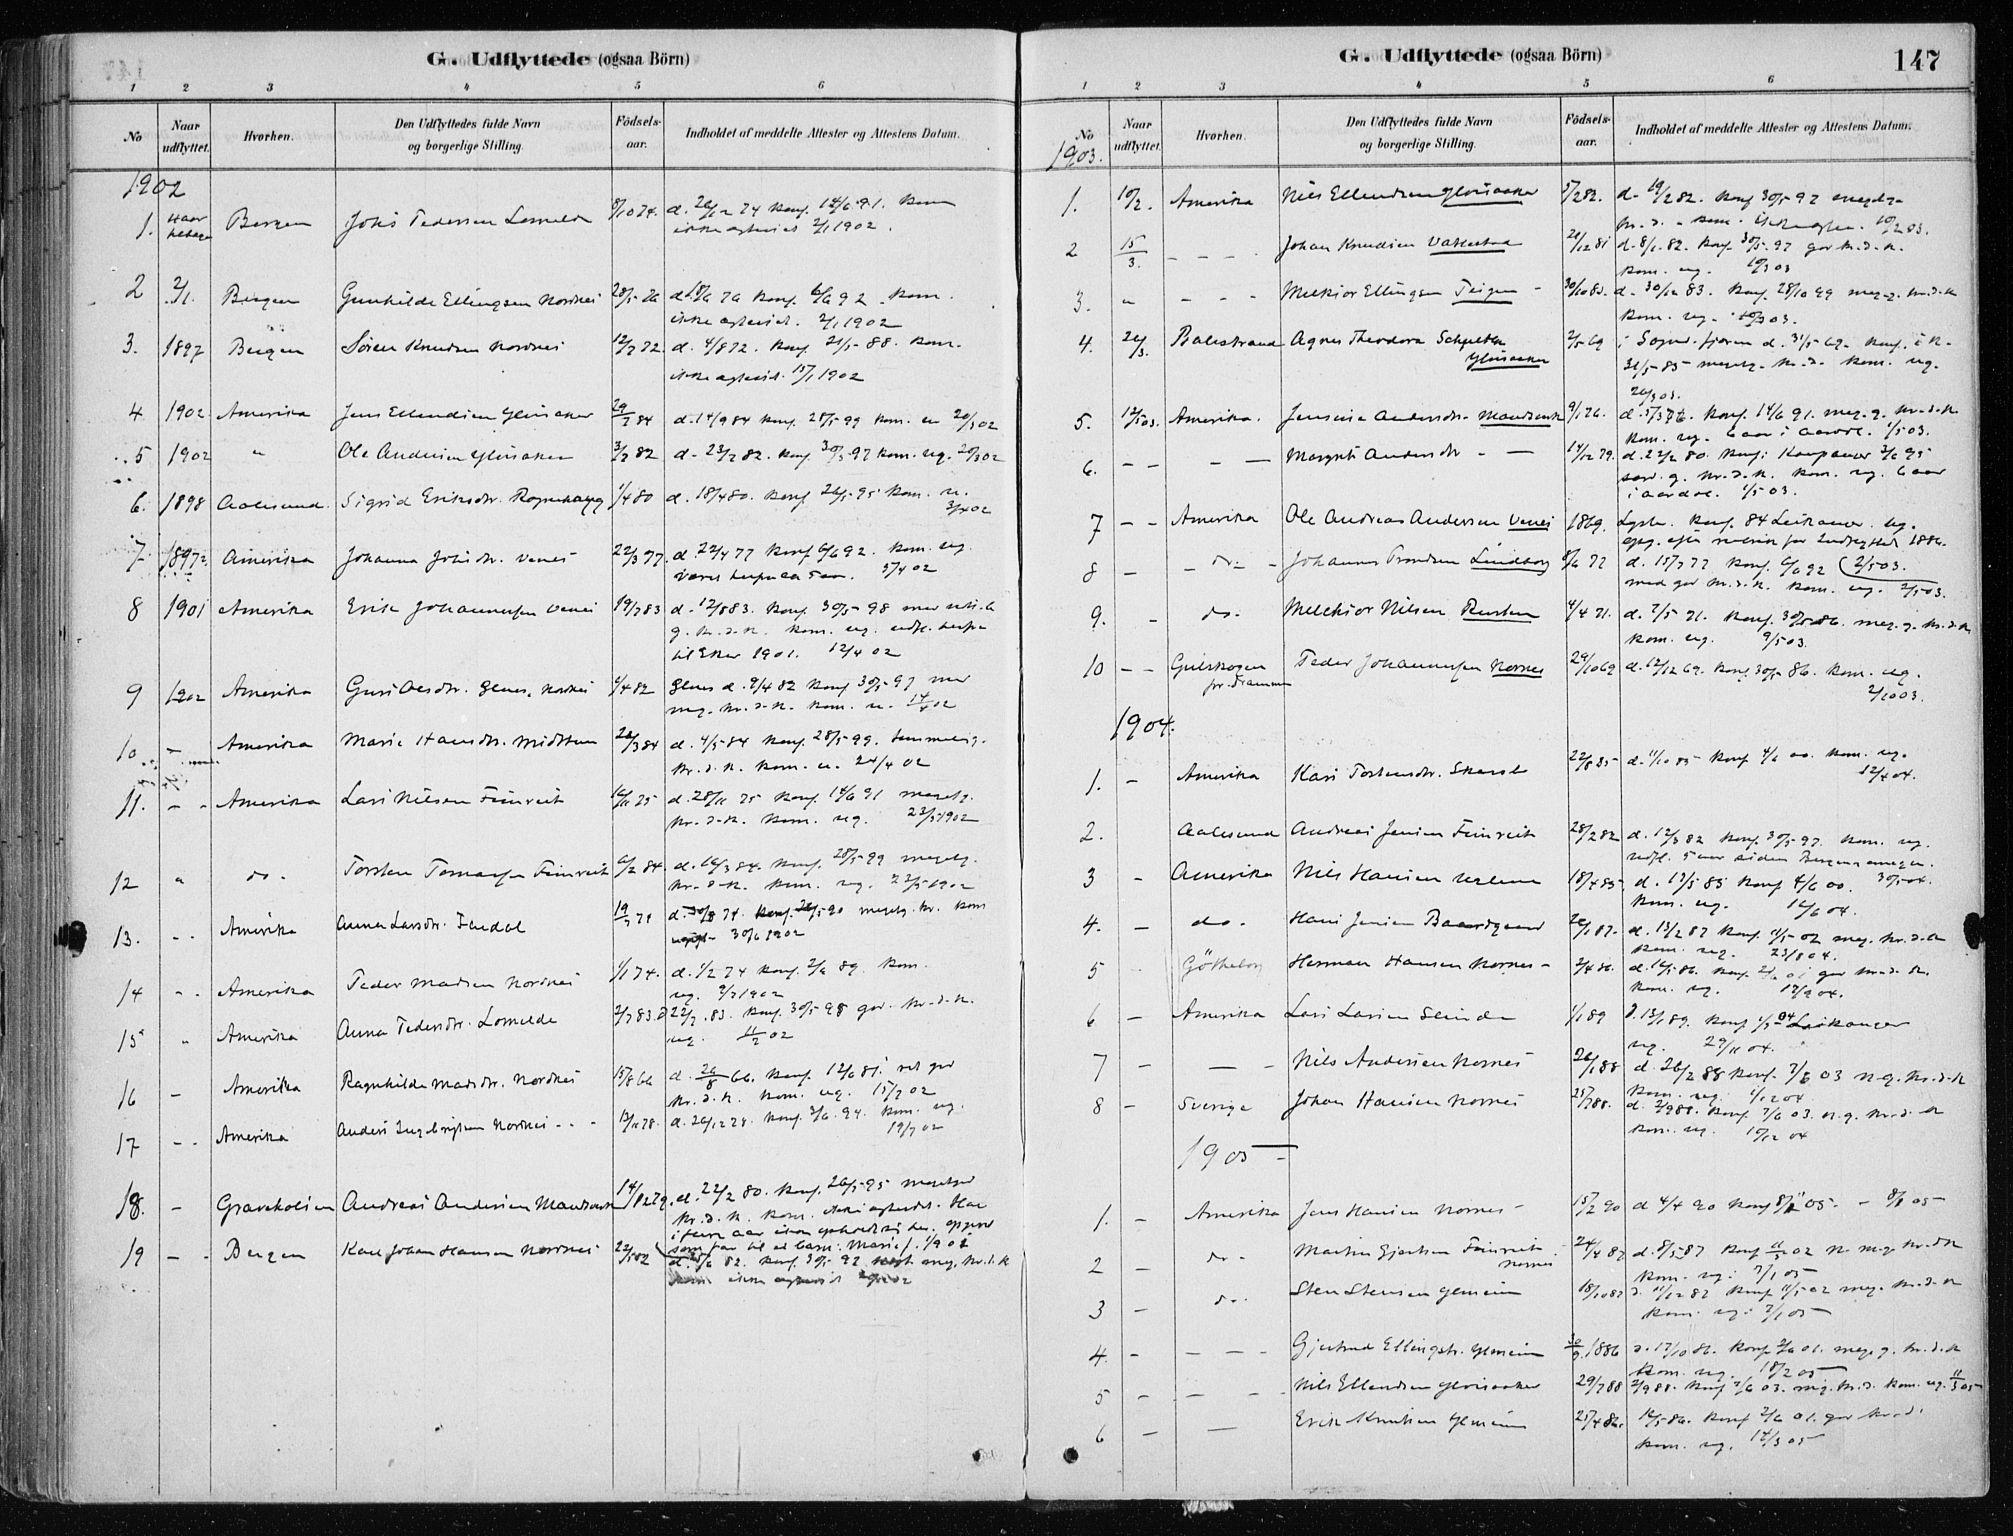 SAB, Sogndal Sokneprestembete, H/Haa/Haac/L0001: Ministerialbok nr. C 1, 1878-1907, s. 147